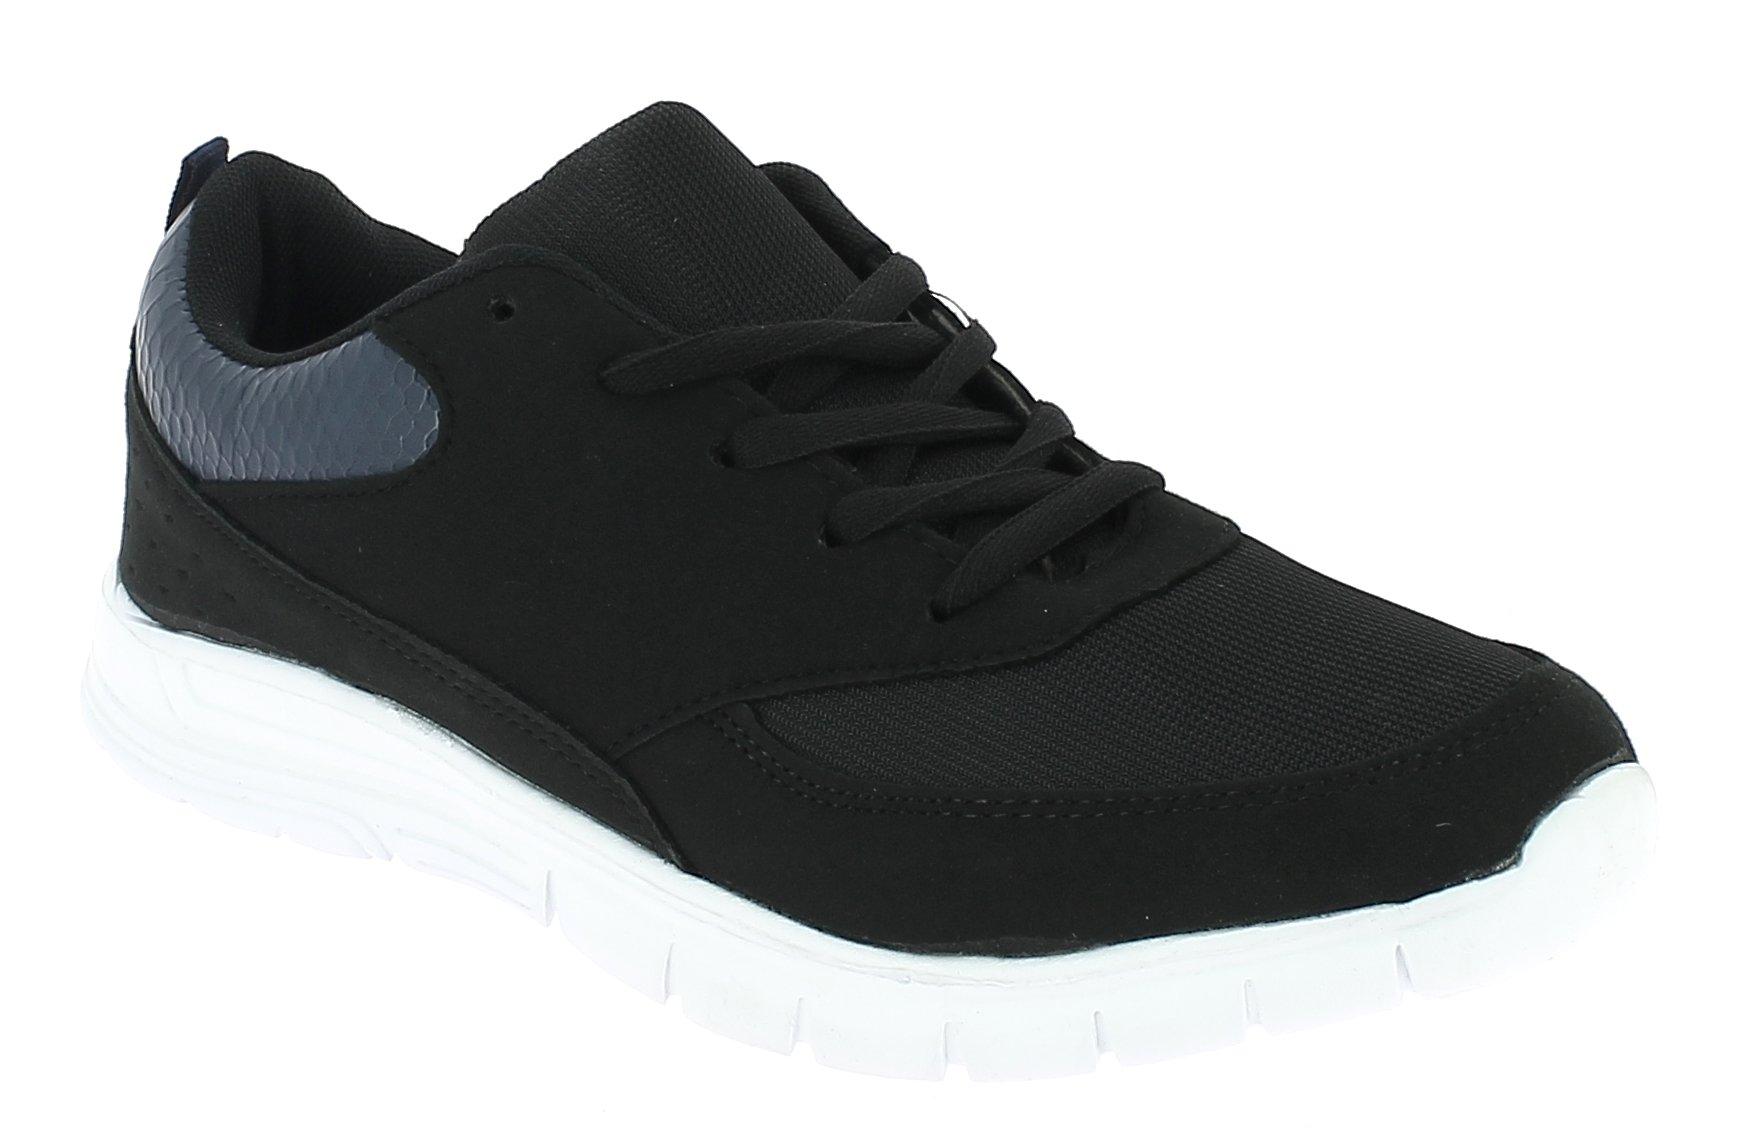 TOPWAY Γυναικείο Casual B414033 Μαύρο - IqShoes - B414033 BLACK -black-38/1/15/1 παπούτσια  αθλητικά   sneakers